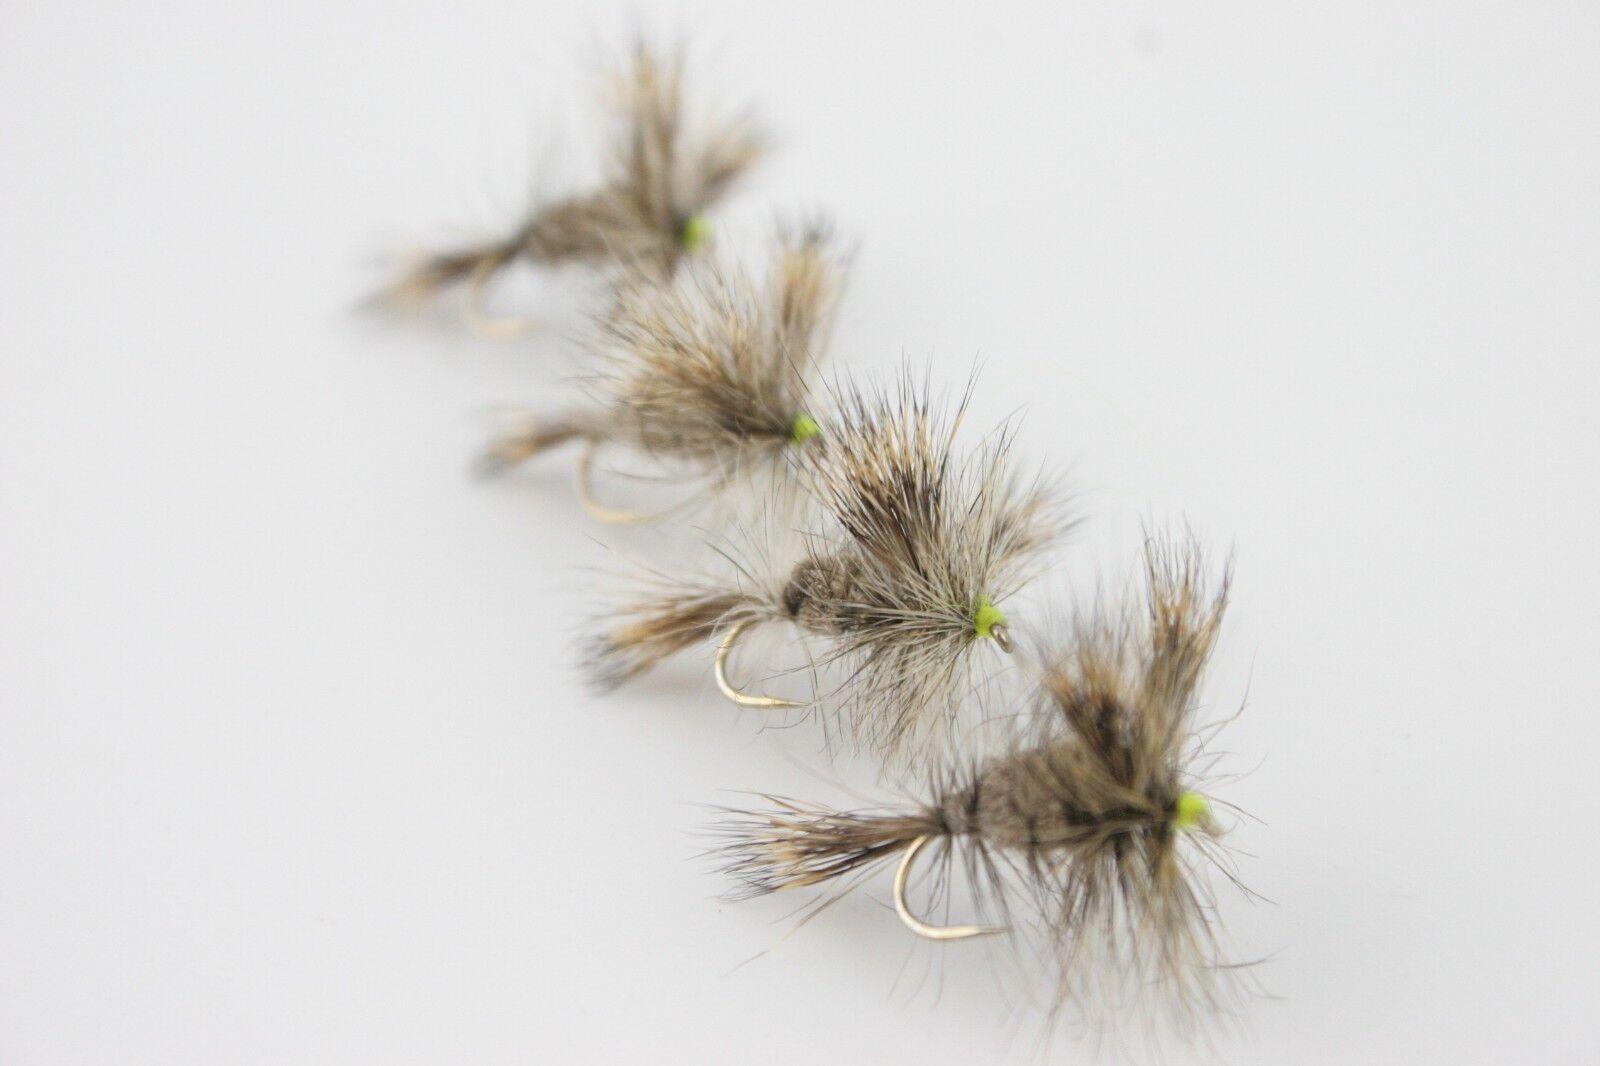 X4 & - X16 Sèche Wulffs - (éphémères) - & Taille années 10 & 12's - Trout Fishing Flies d2294b